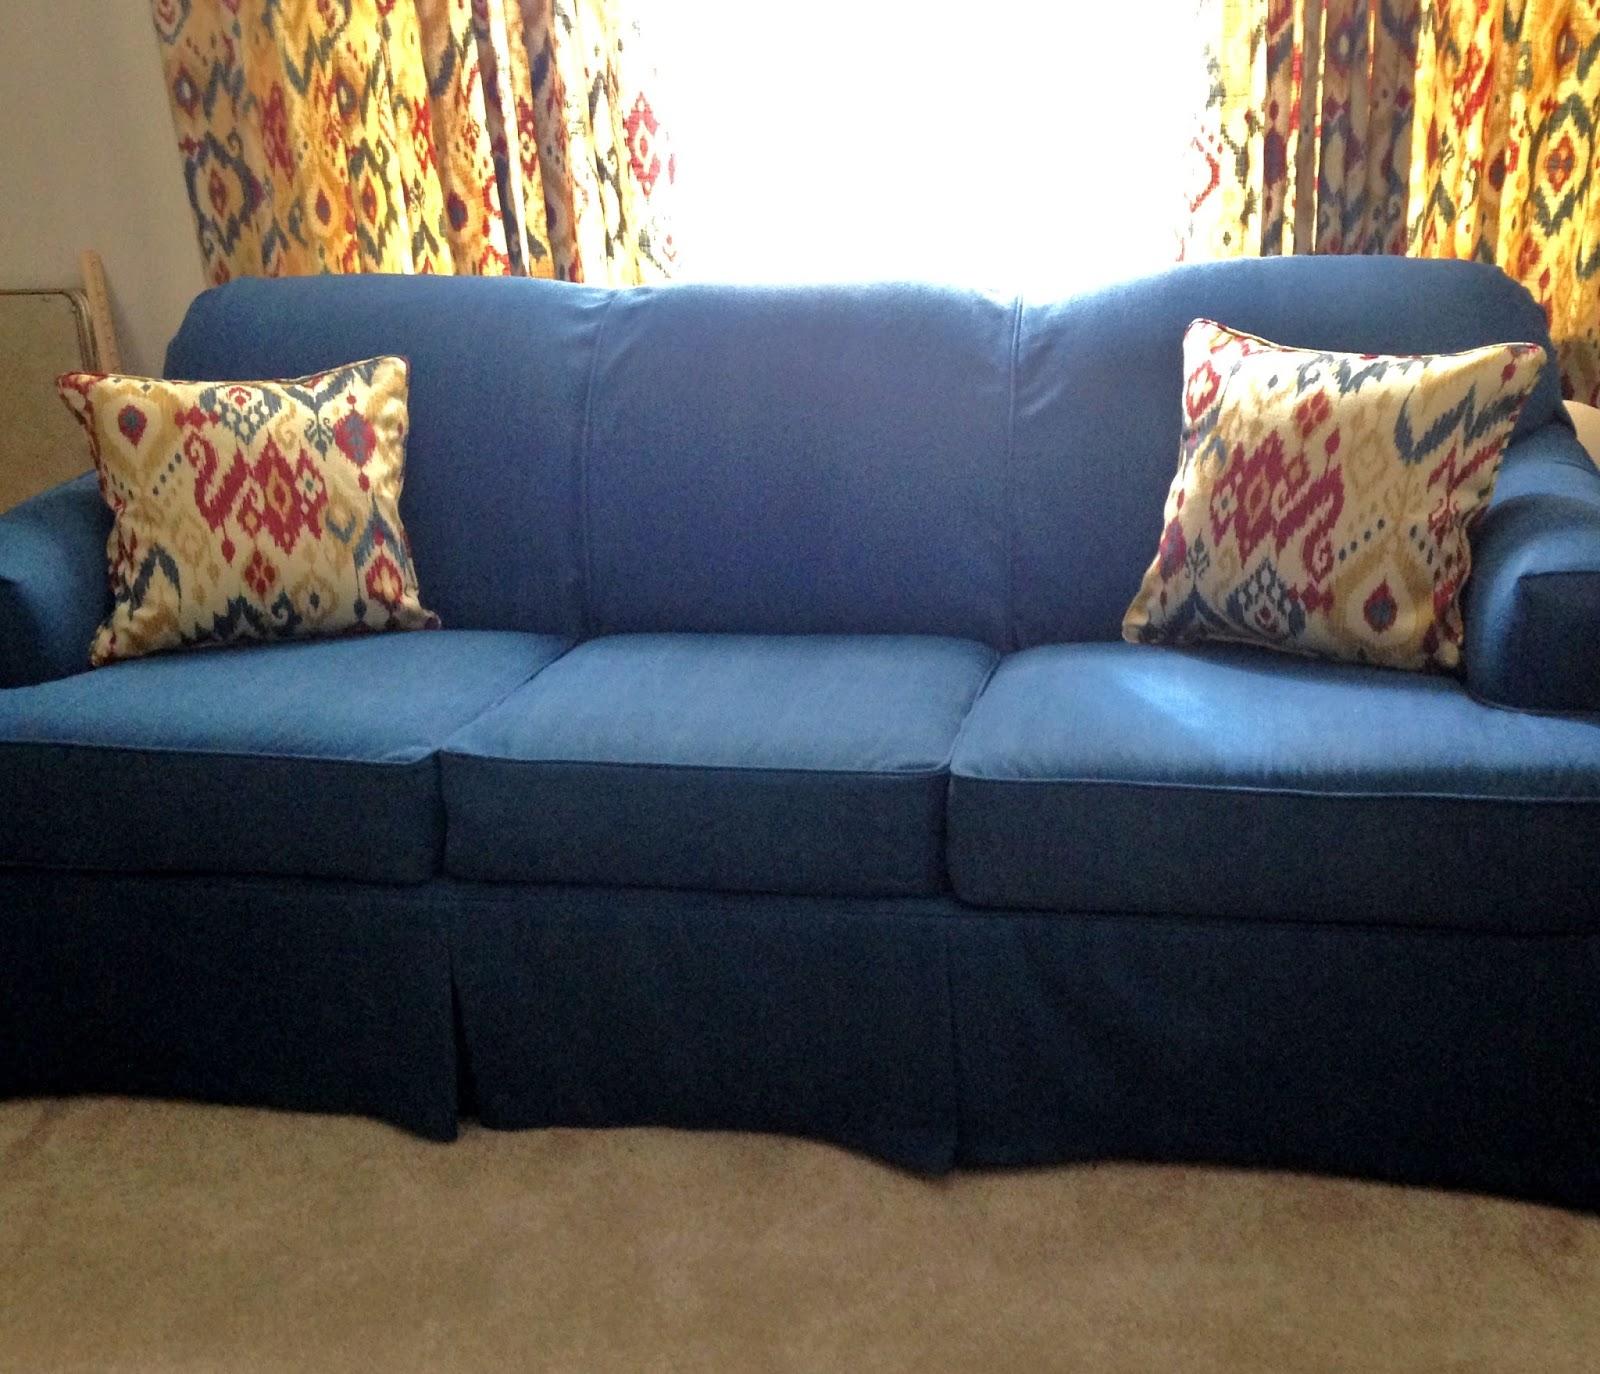 Sectional Sleeper Sofa Slipcovers Tucson Pam Morris Sews: Denim On A